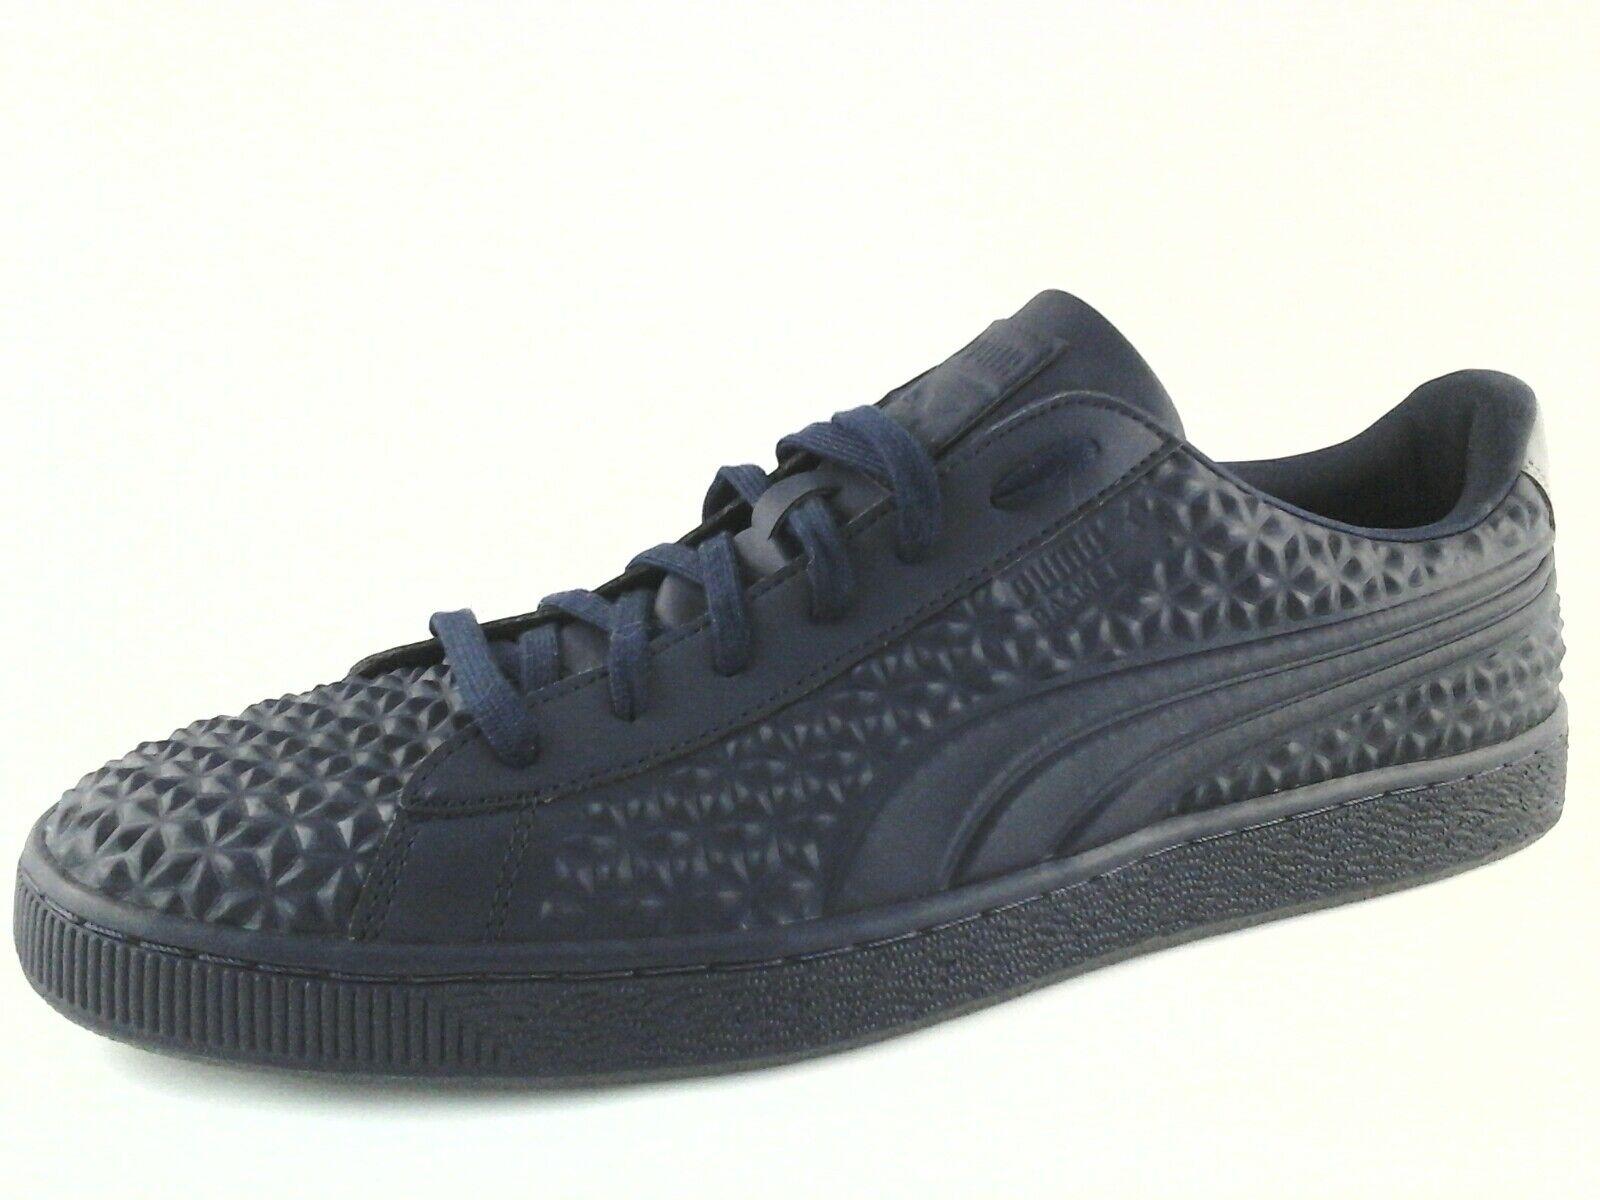 PUMA BASKET Sneakers Diamond STUD EMBOSSED Blue Casual Shoes US 13 EU 47 0 Scarpe classiche da uomo